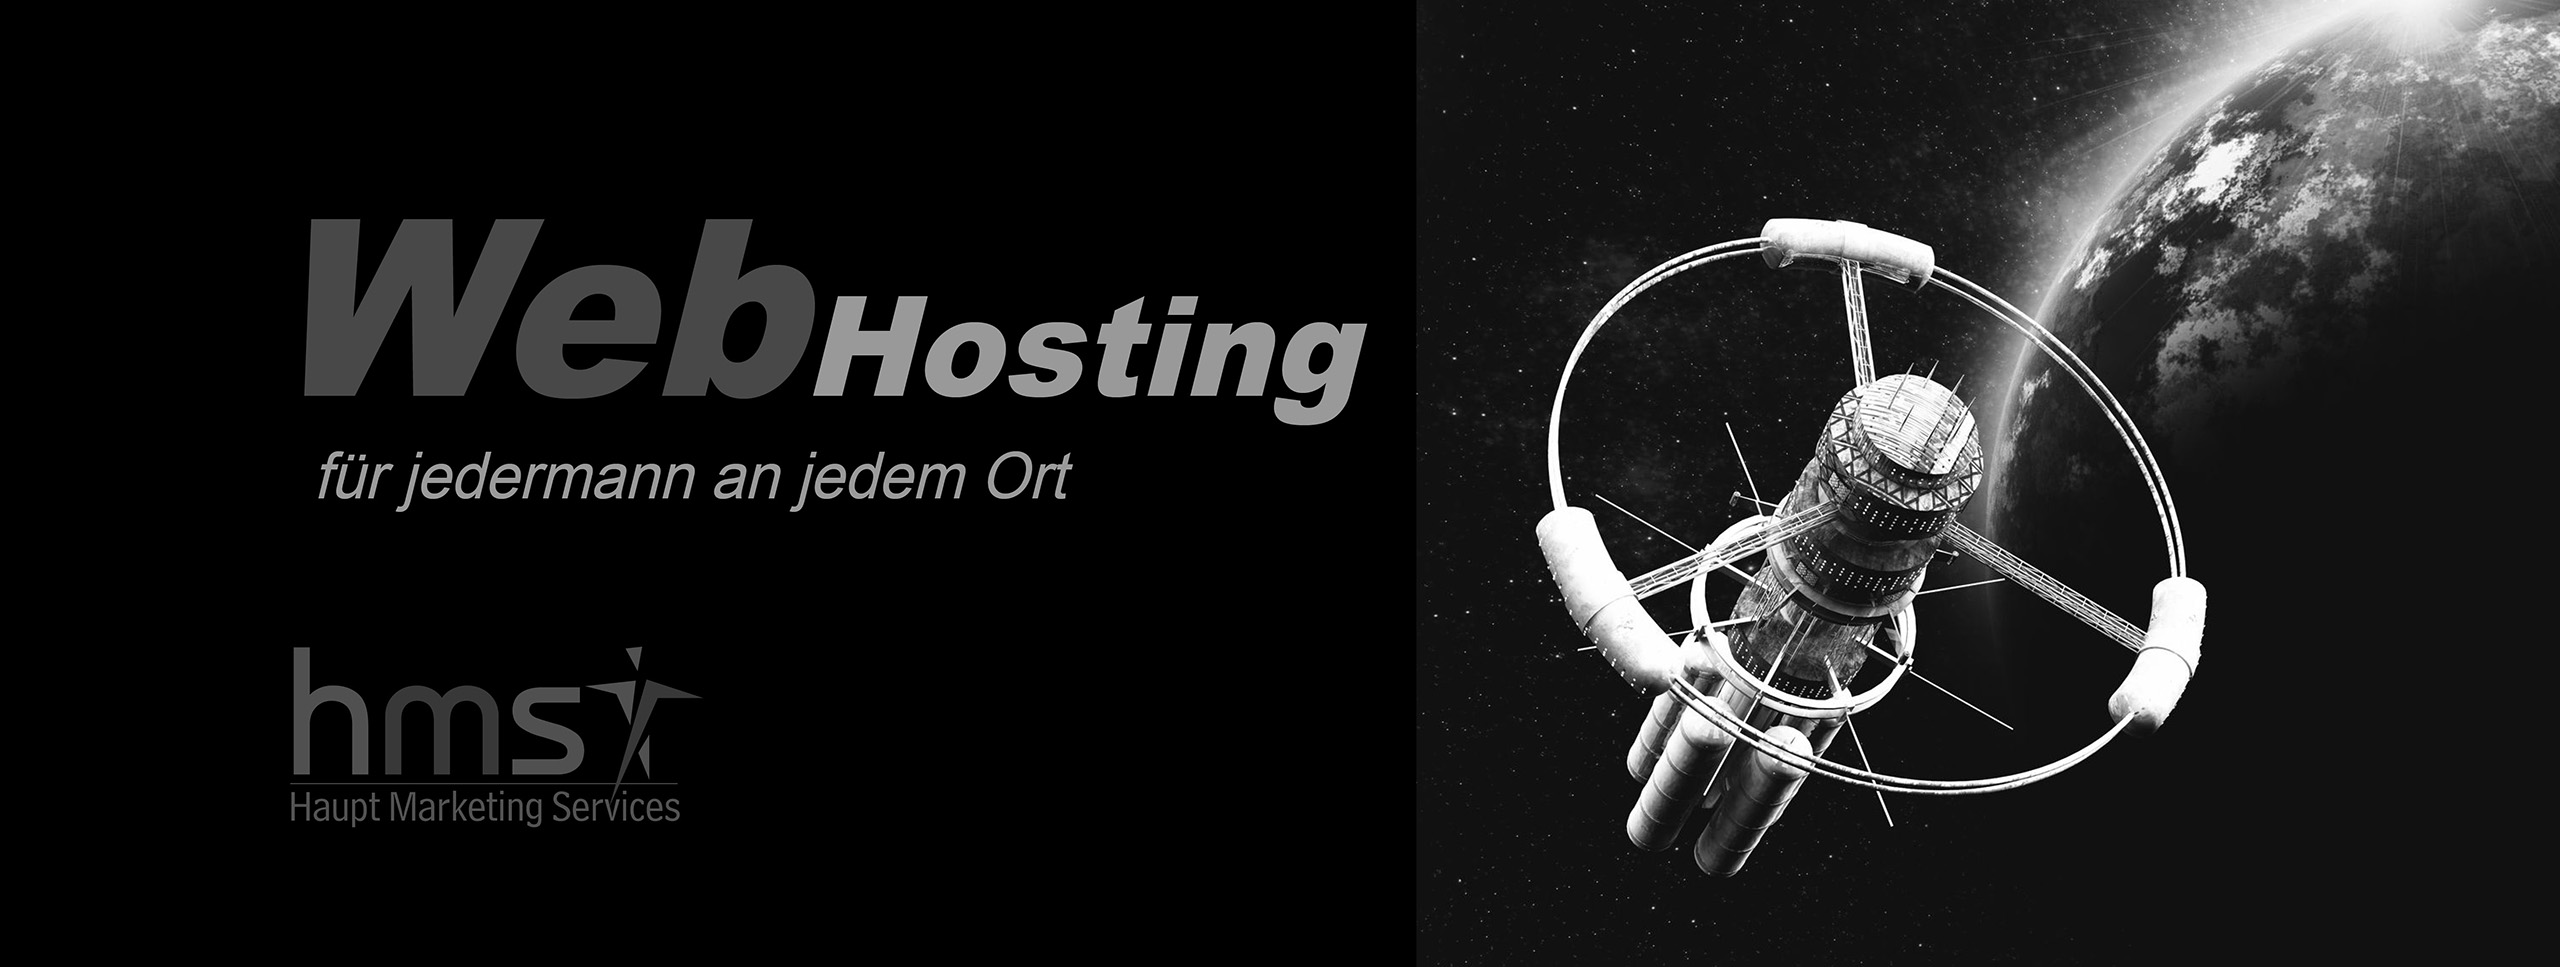 007_Web01_2017_Webhosting_sw